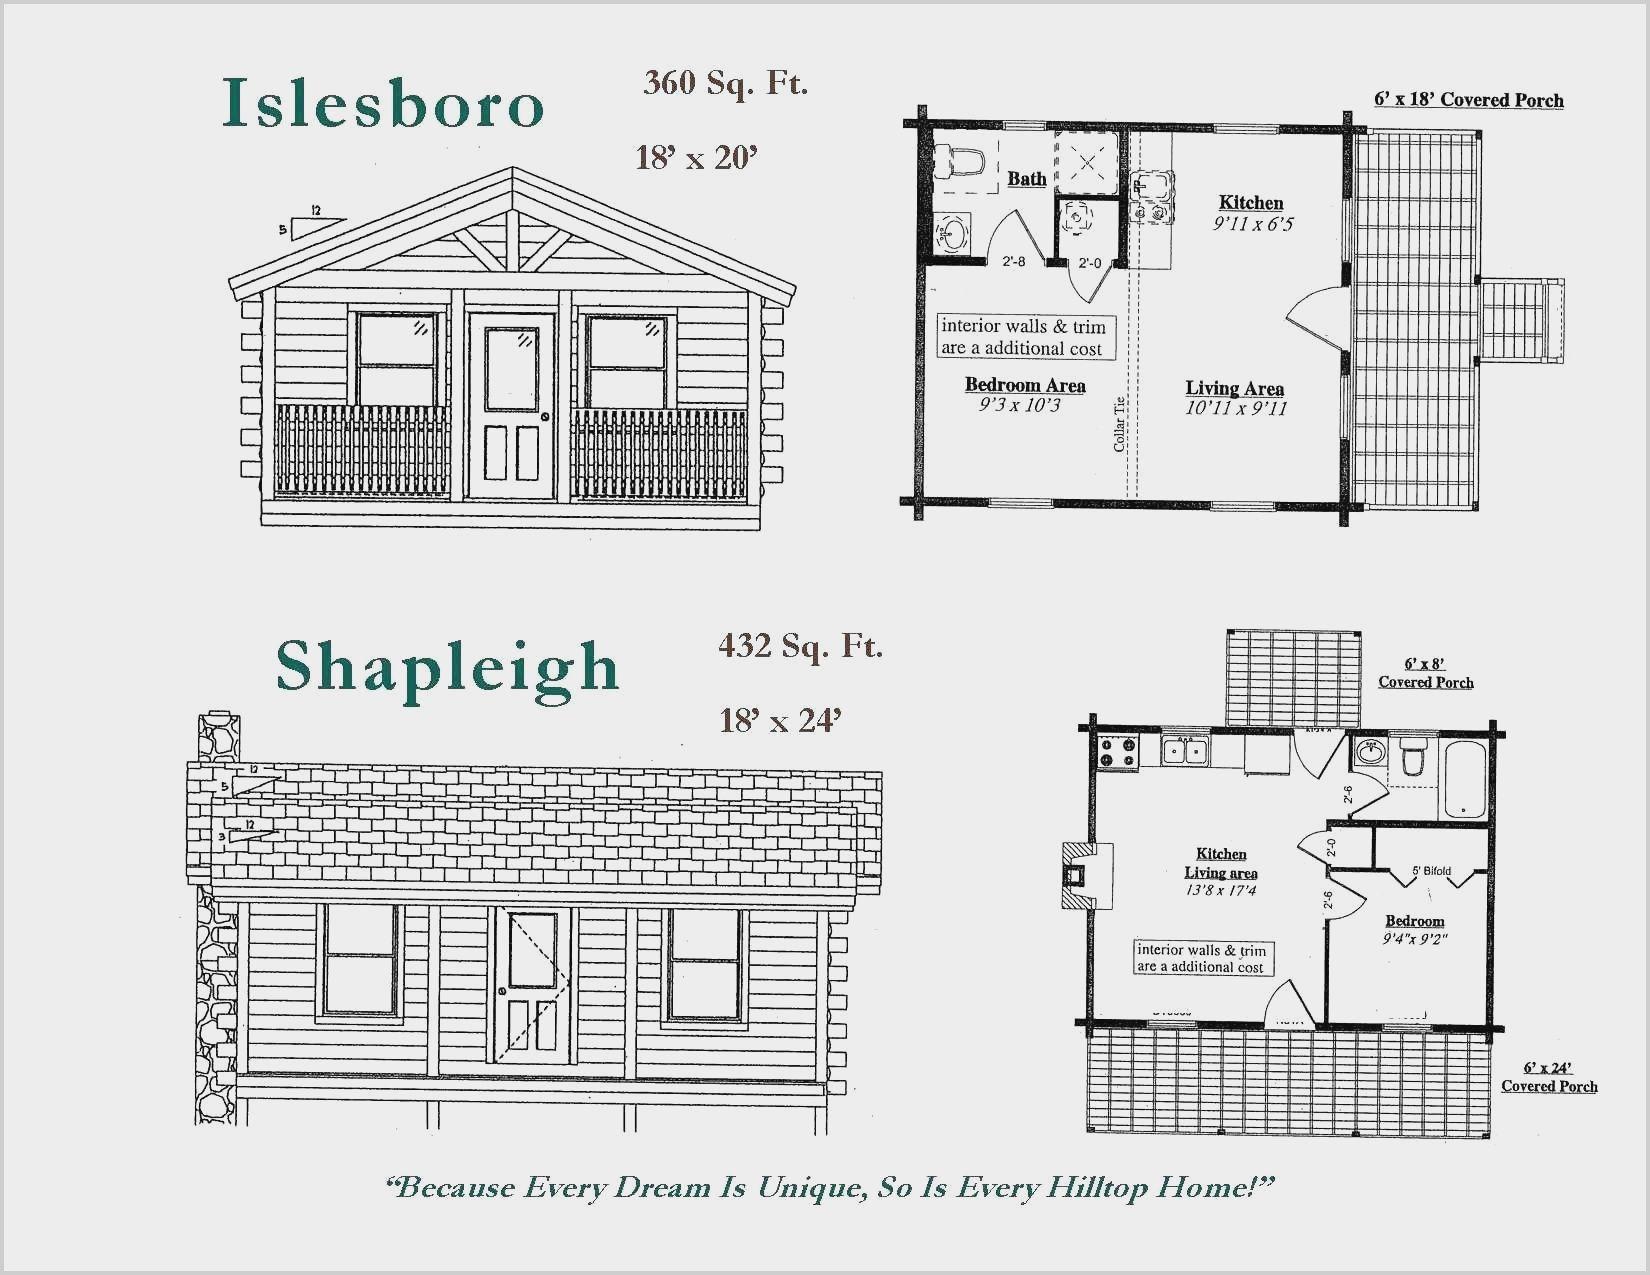 Designing A Master Bedroom Addition In 2020 Modular Home Floor Plans Floor Plan Design House Floor Plans